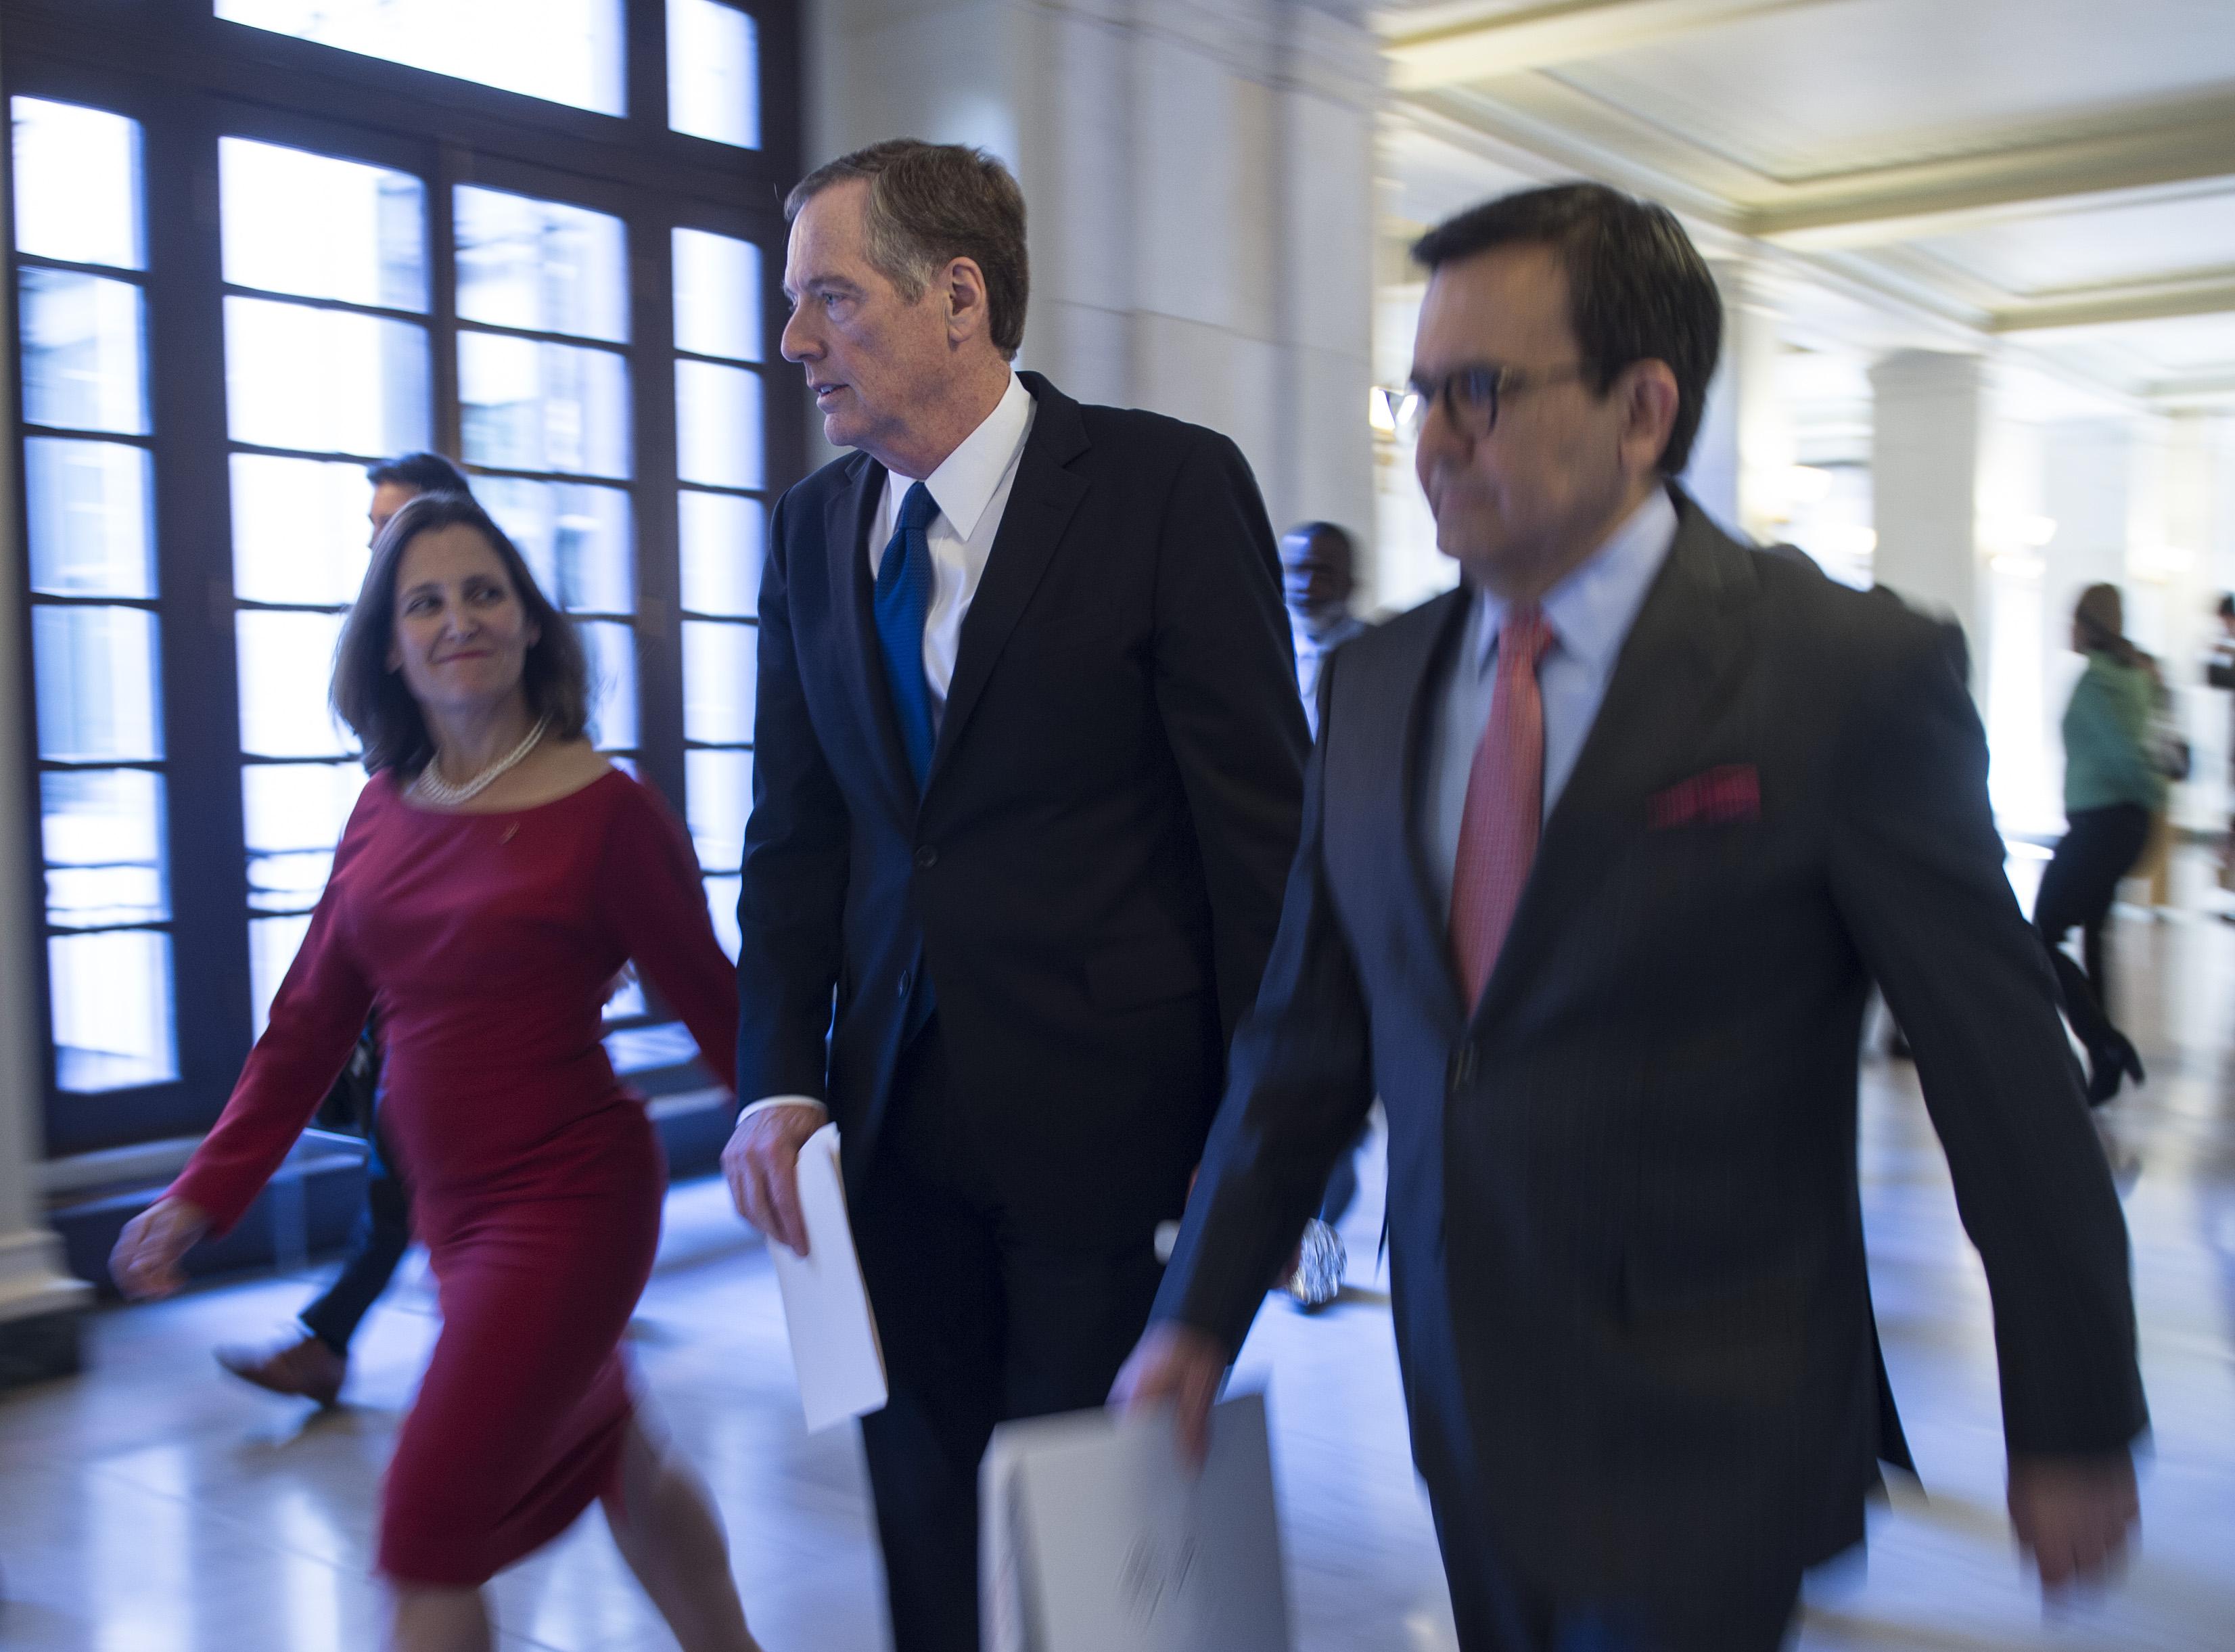 NAFTA談判截止期限前 美加終達協議